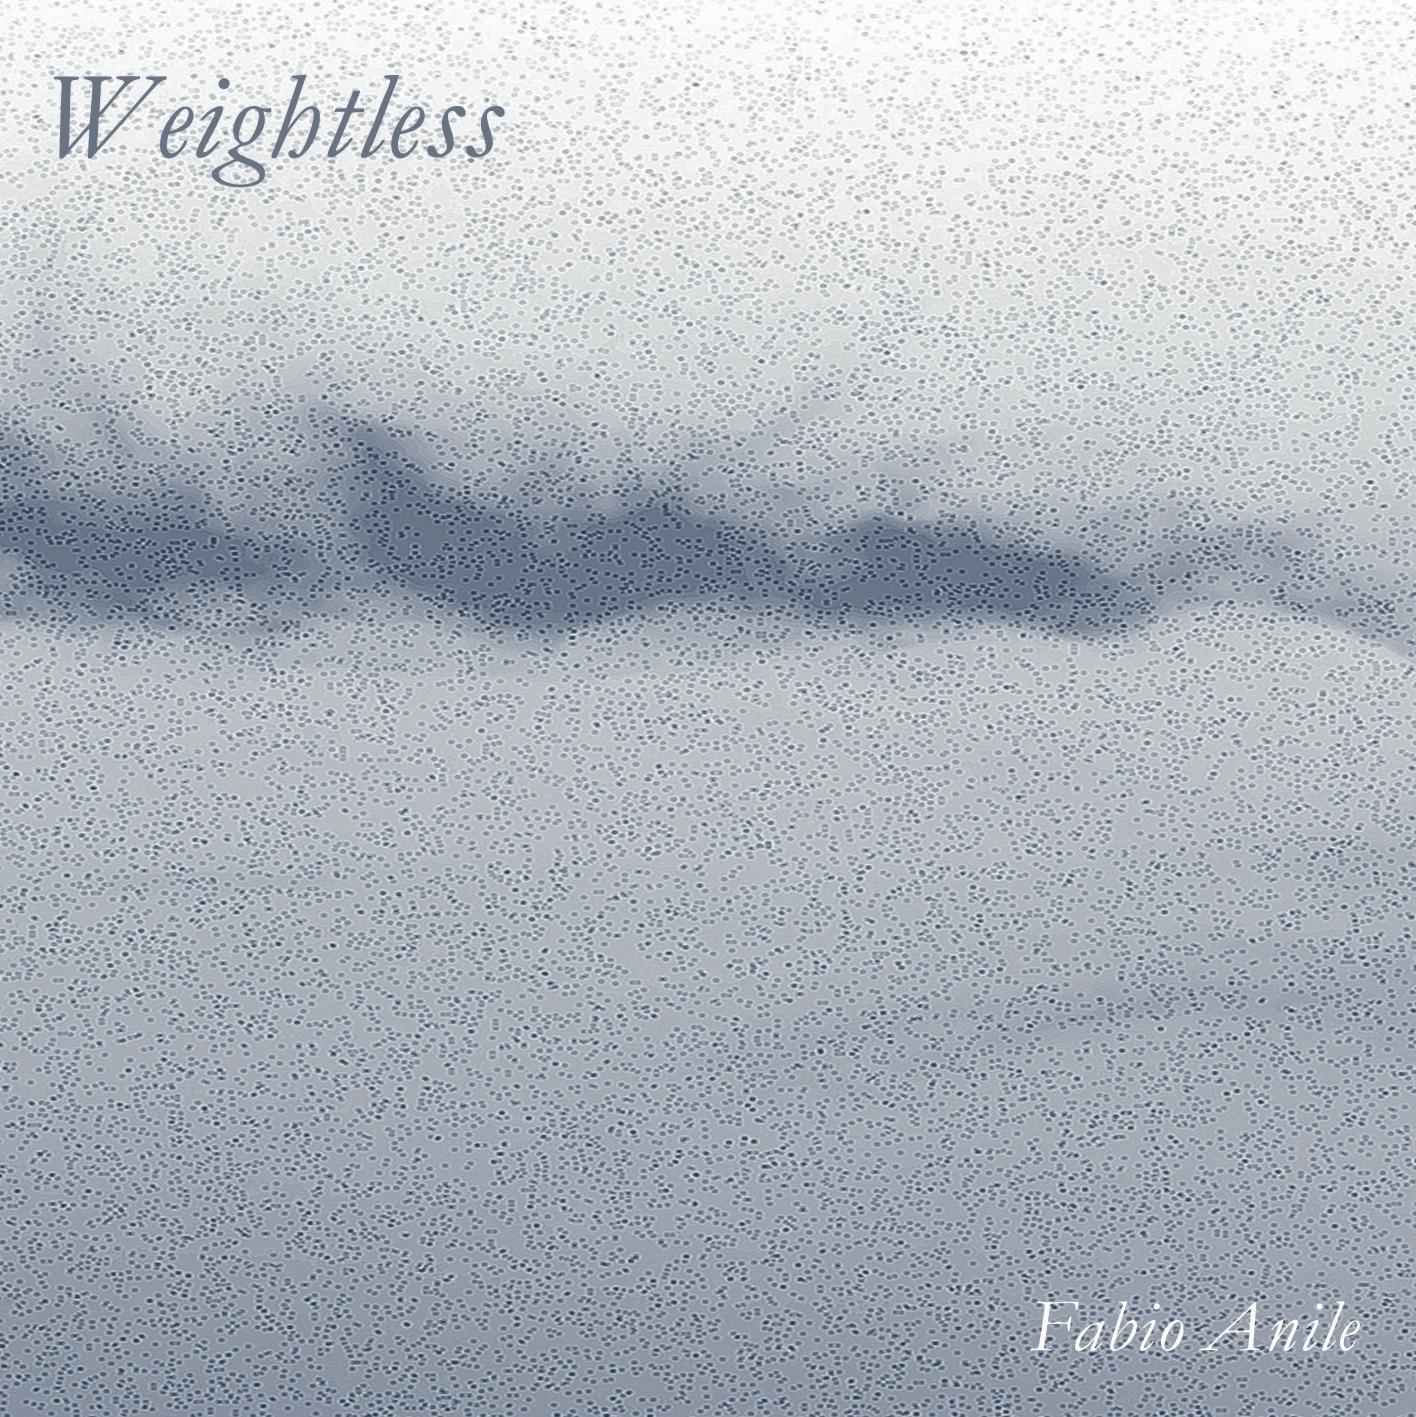 1 Weightless